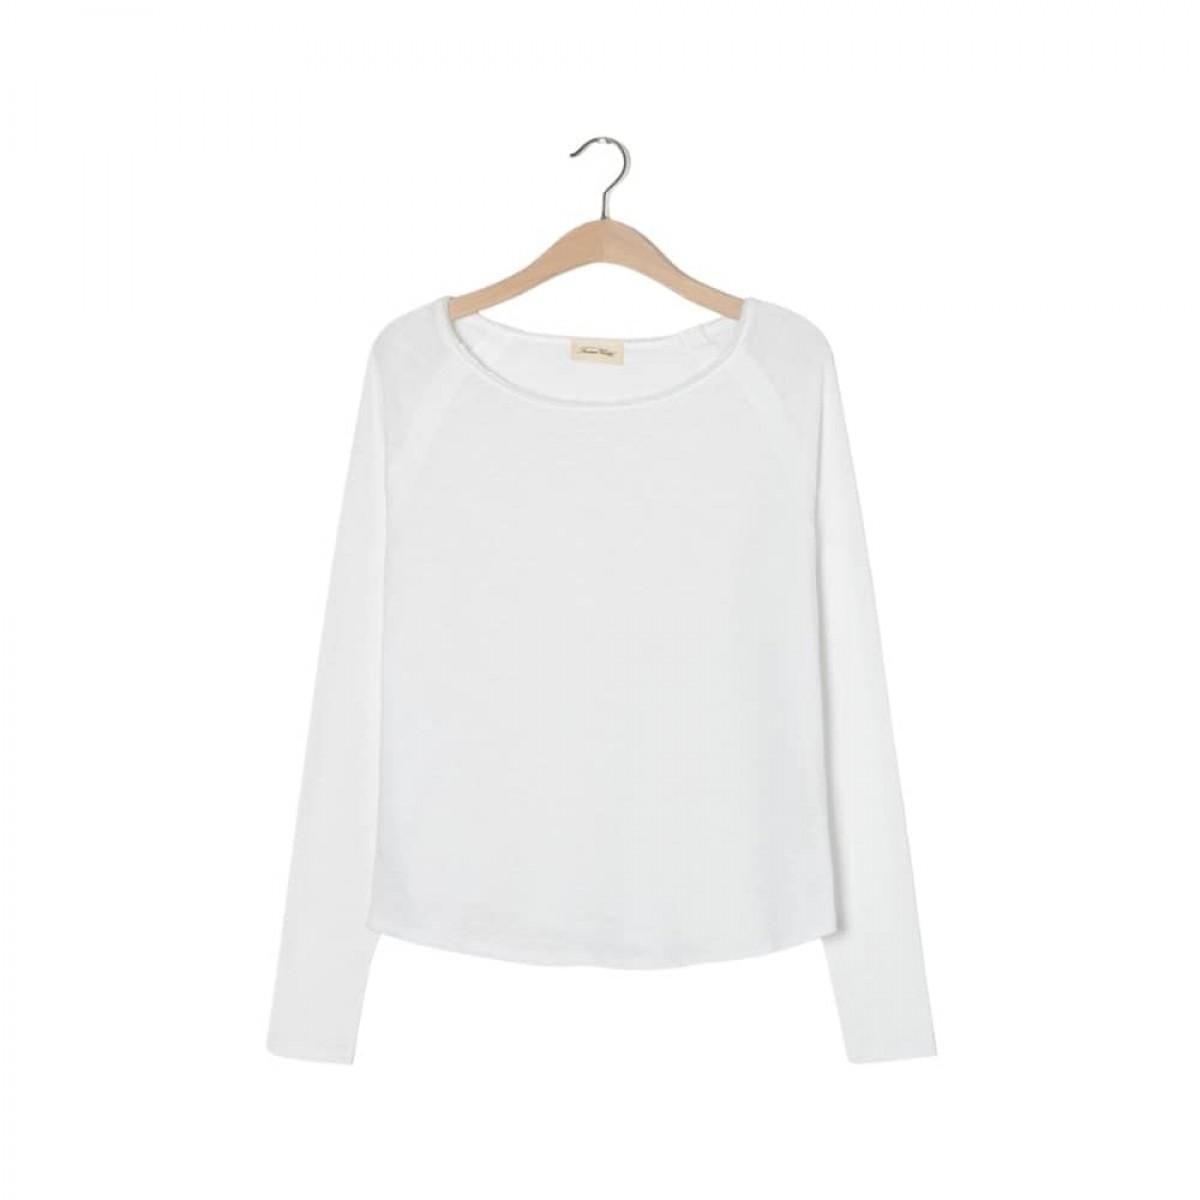 sonoma bluse - white - front